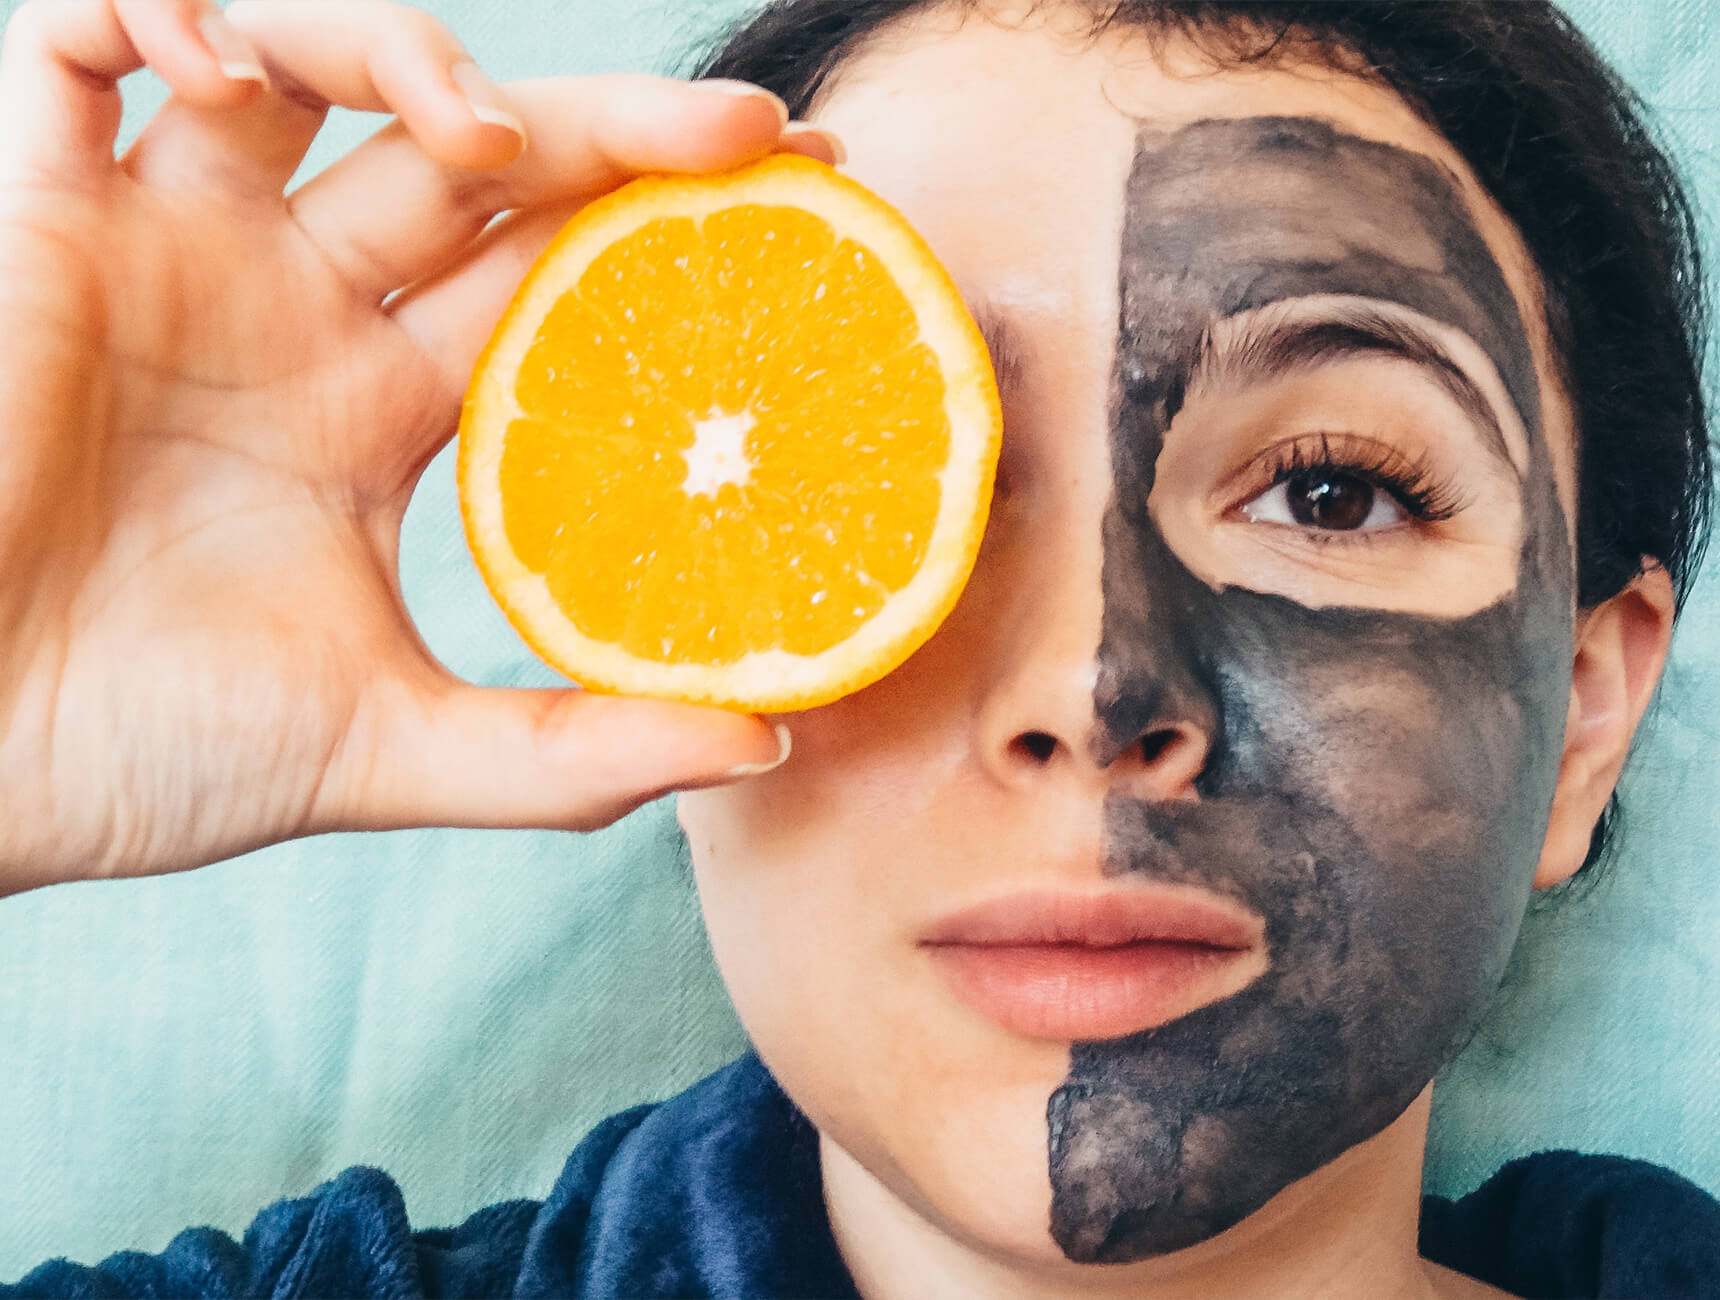 Skincare: expectations vs. reality